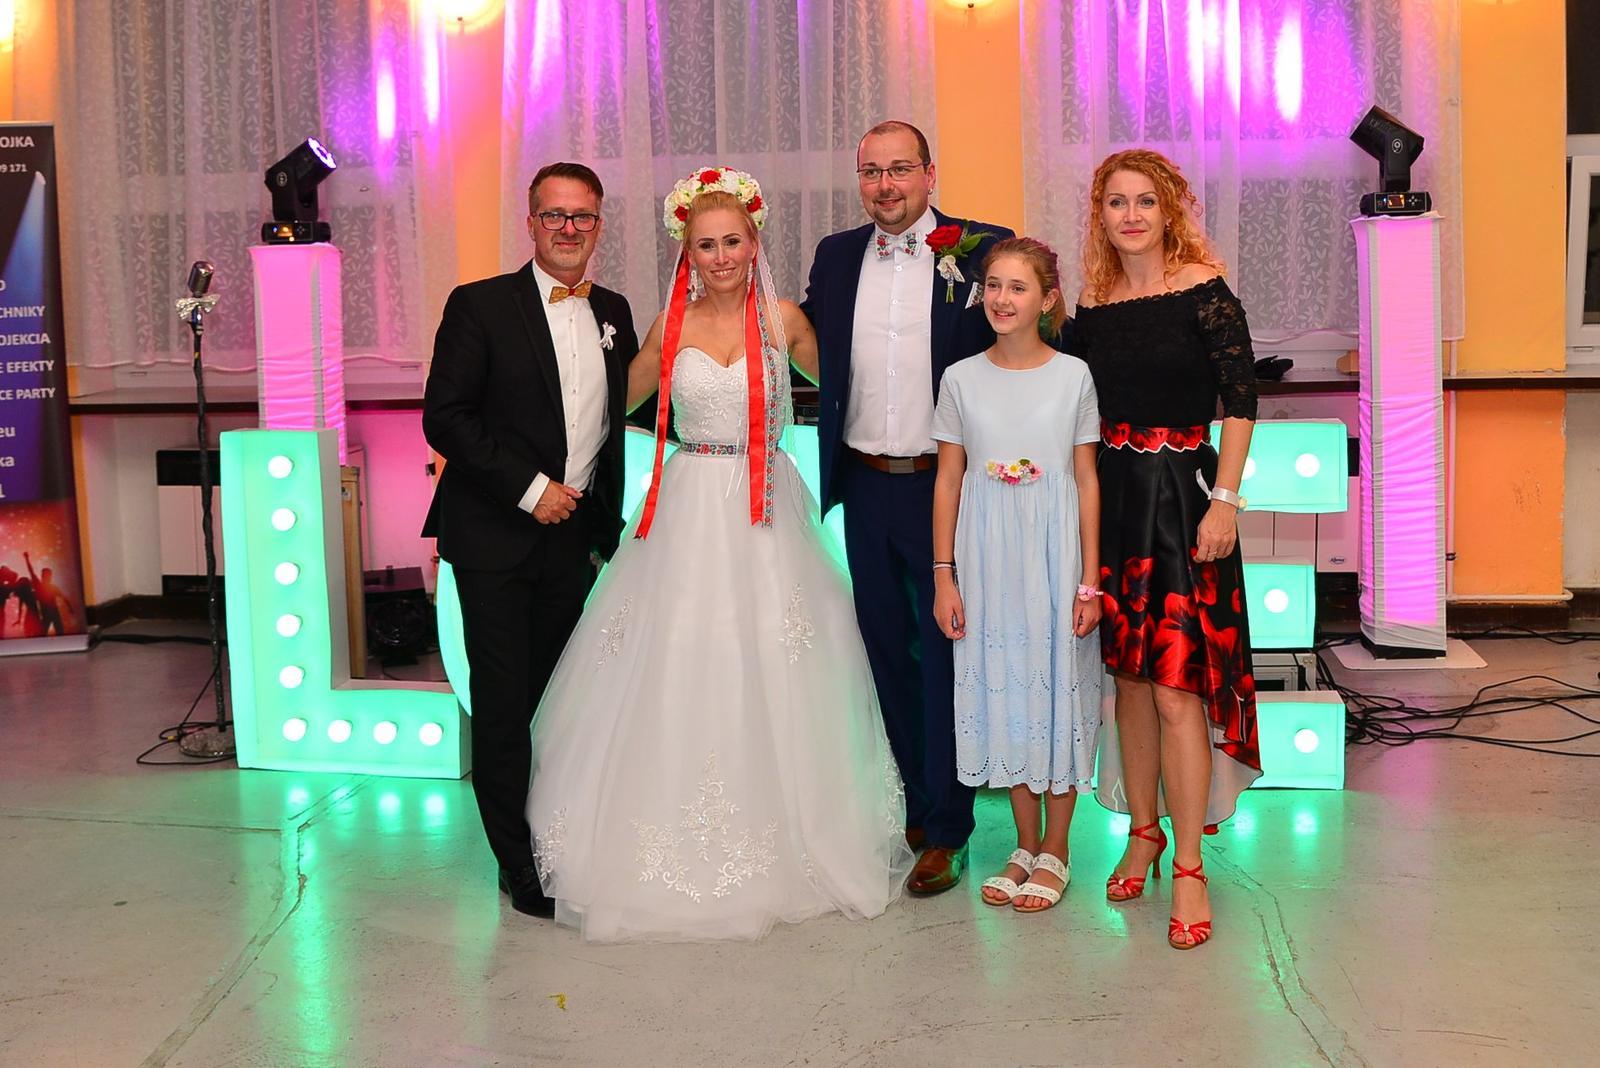 Folklorna svadba M+M, 24.8.2019 Turany - Folklorna svadba M+M, 24.8.2019 Turany, autor Foto: Multimediálny DJ Maroš Chvojka 013